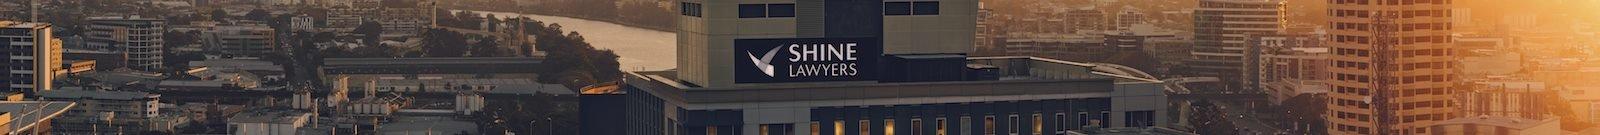 professional negligence law